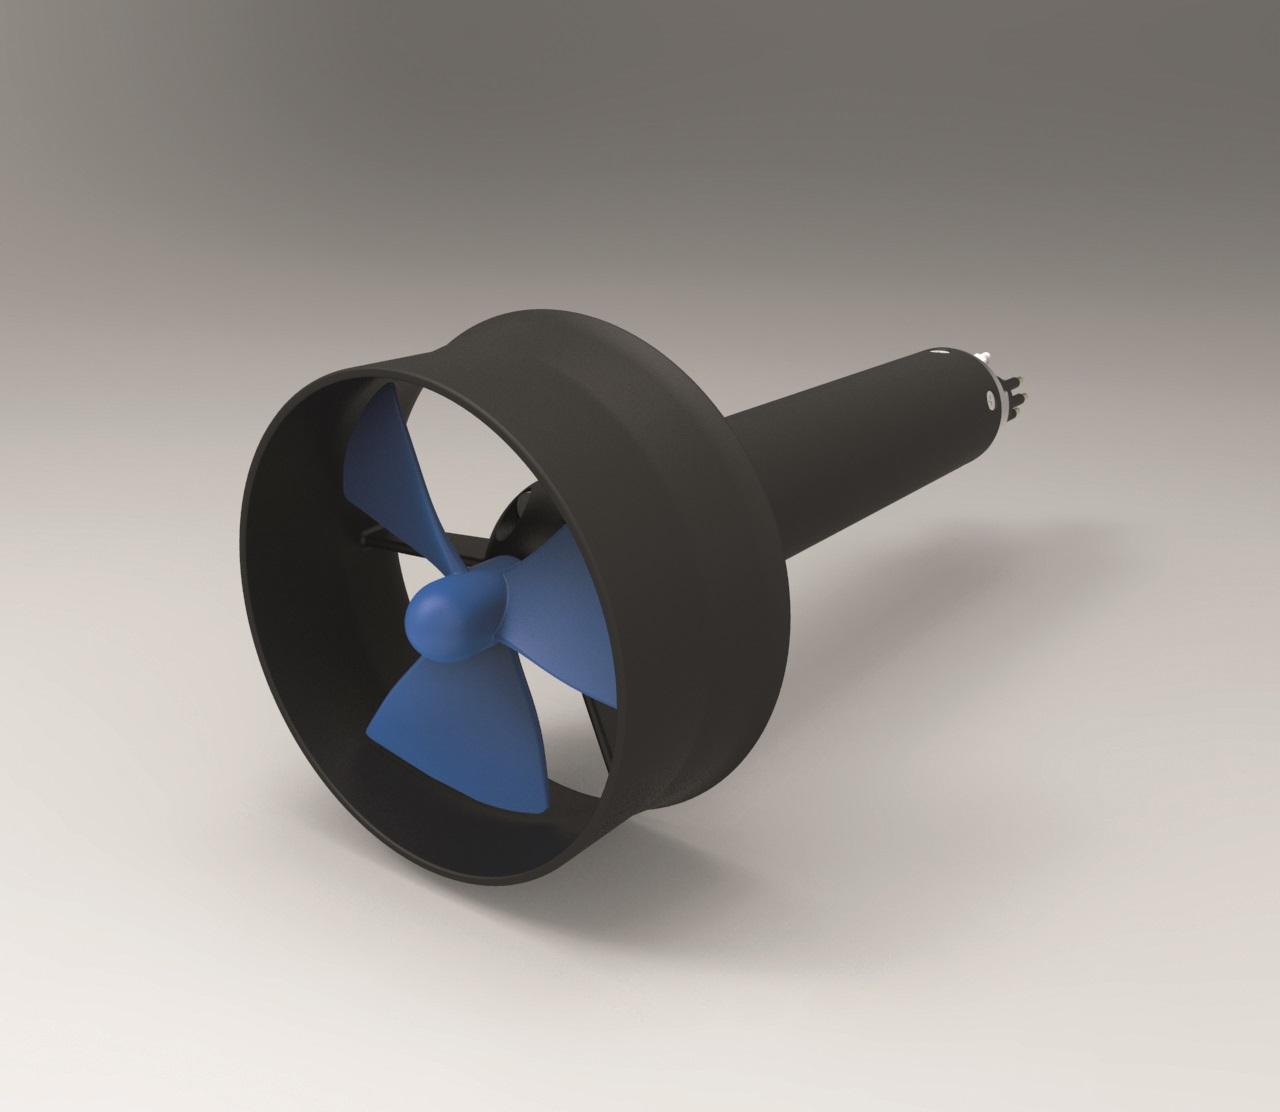 Motors for marine applications like props